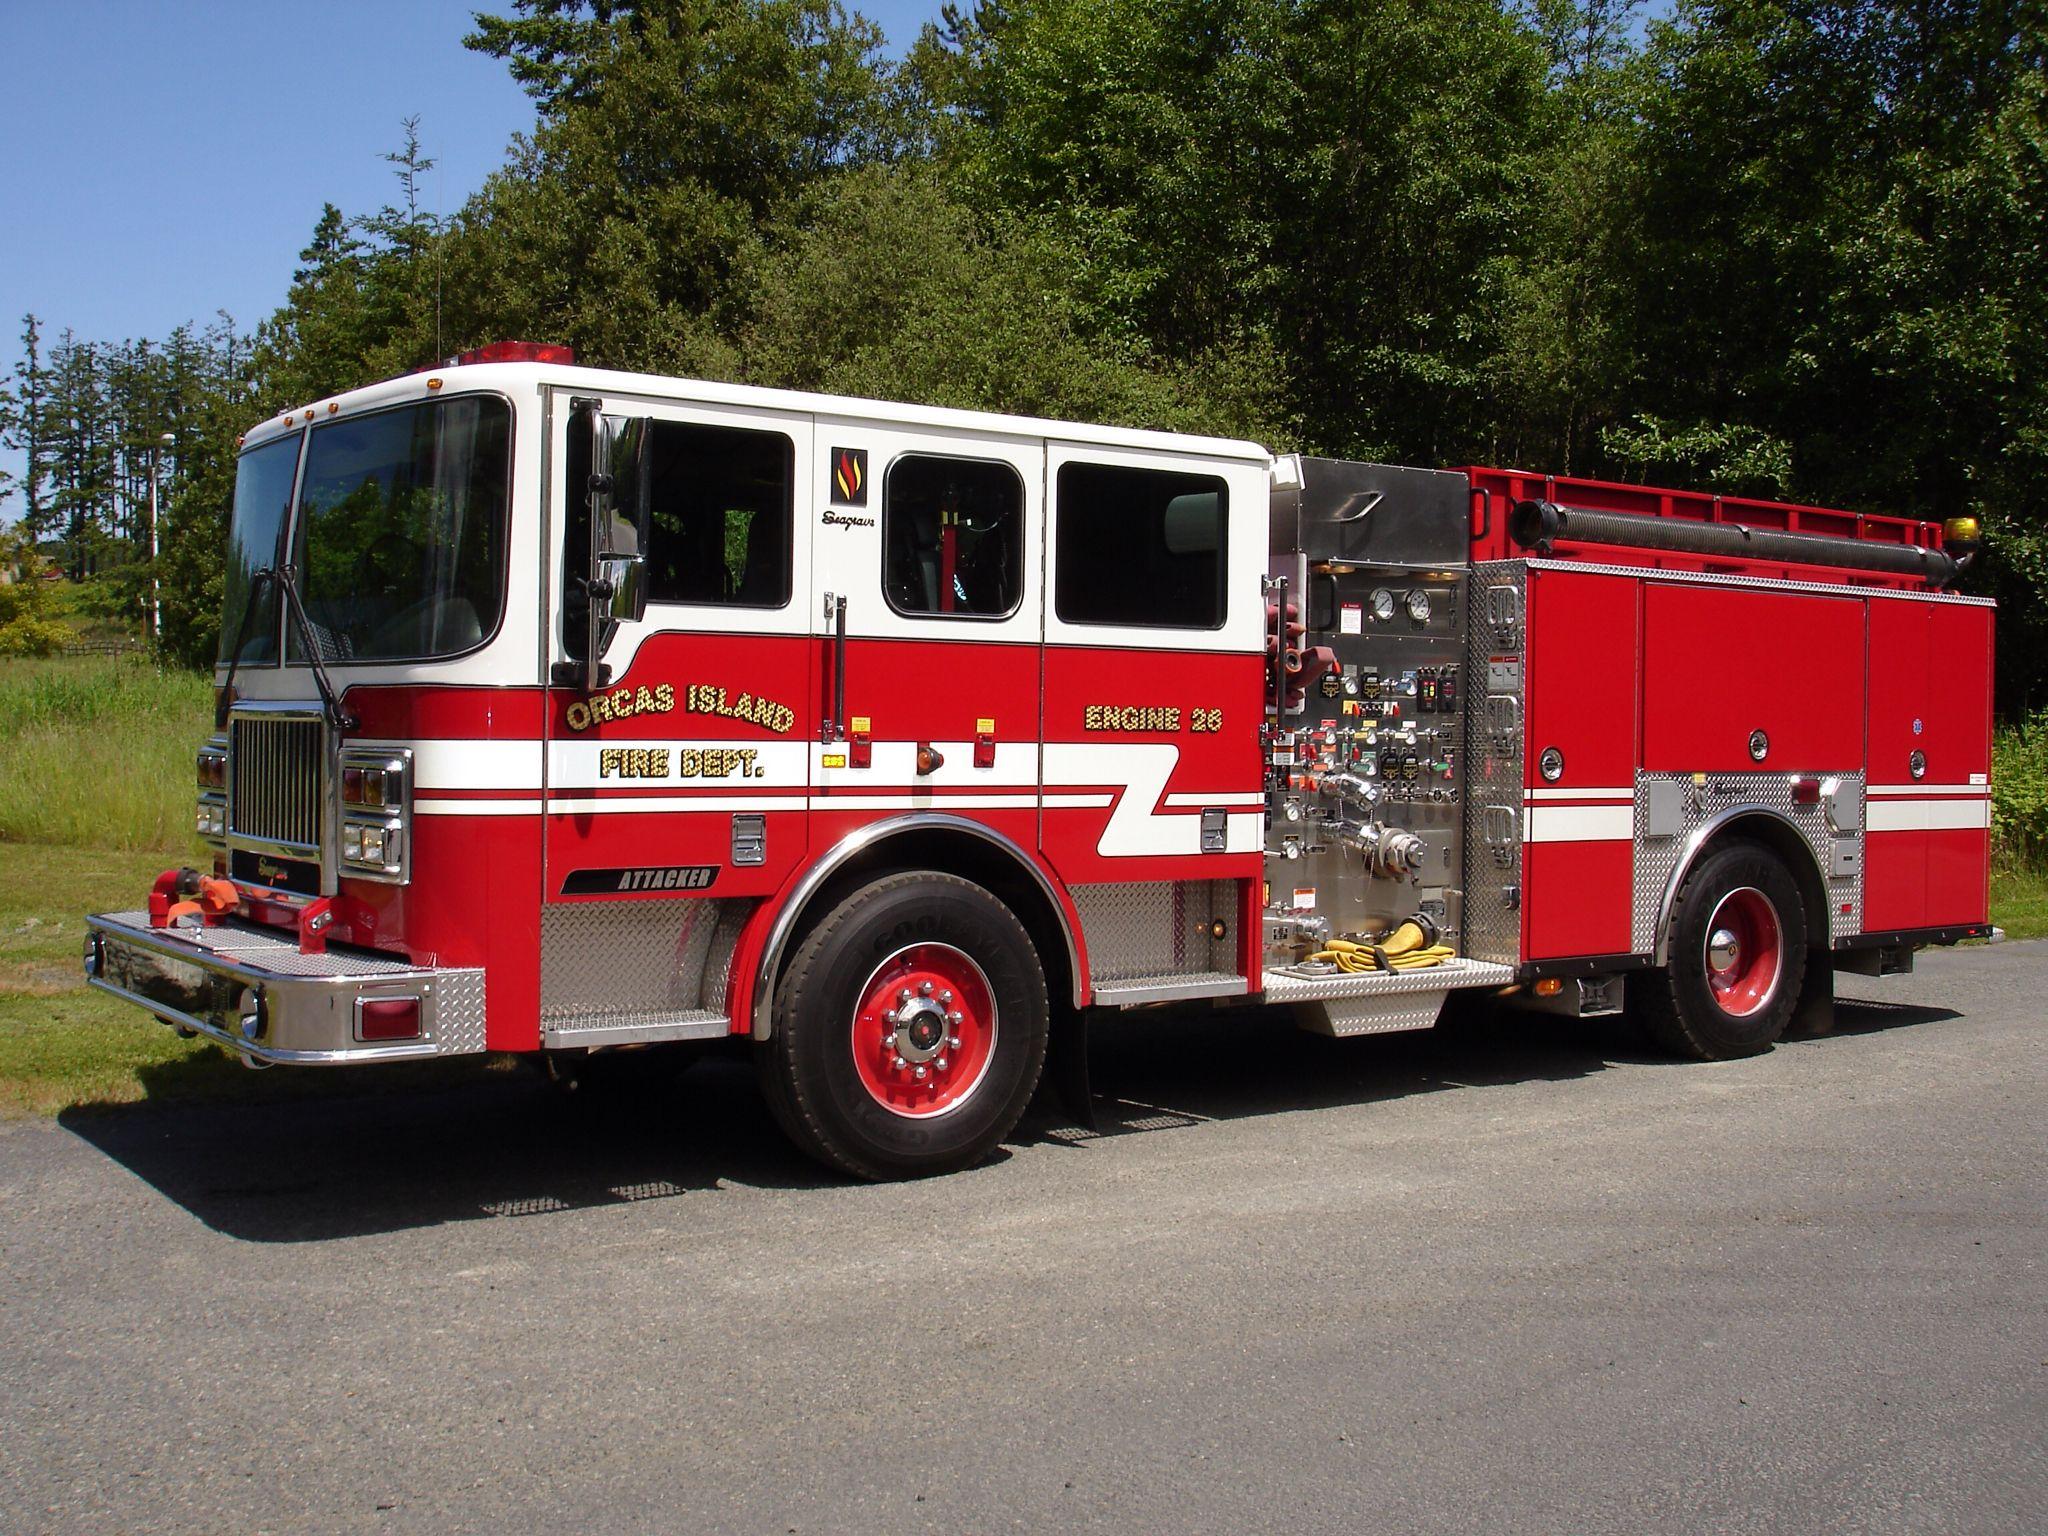 medium resolution of orcas island fire rescue engine 26 2004 seagrave attacker 1250 1000